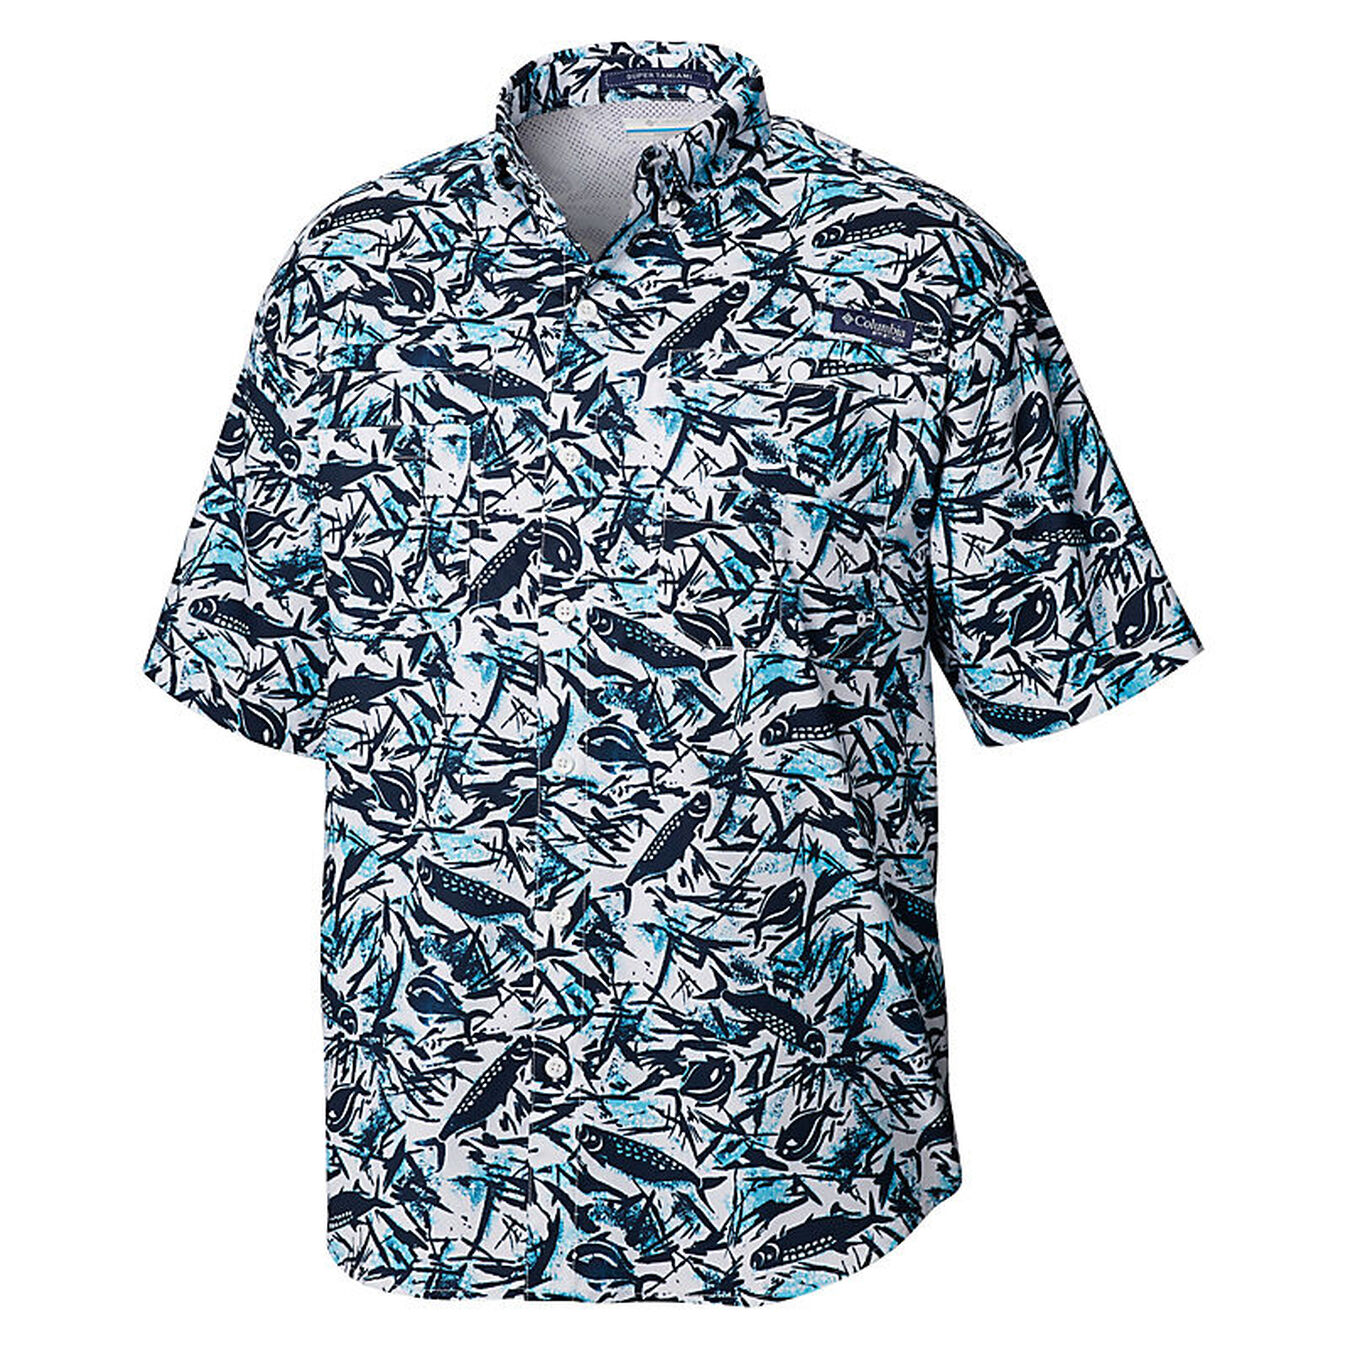 Columbia Mens PFG Super Tamiami Short Sleeve Shirt UPF 40 Sun Protection Wicking Fabric